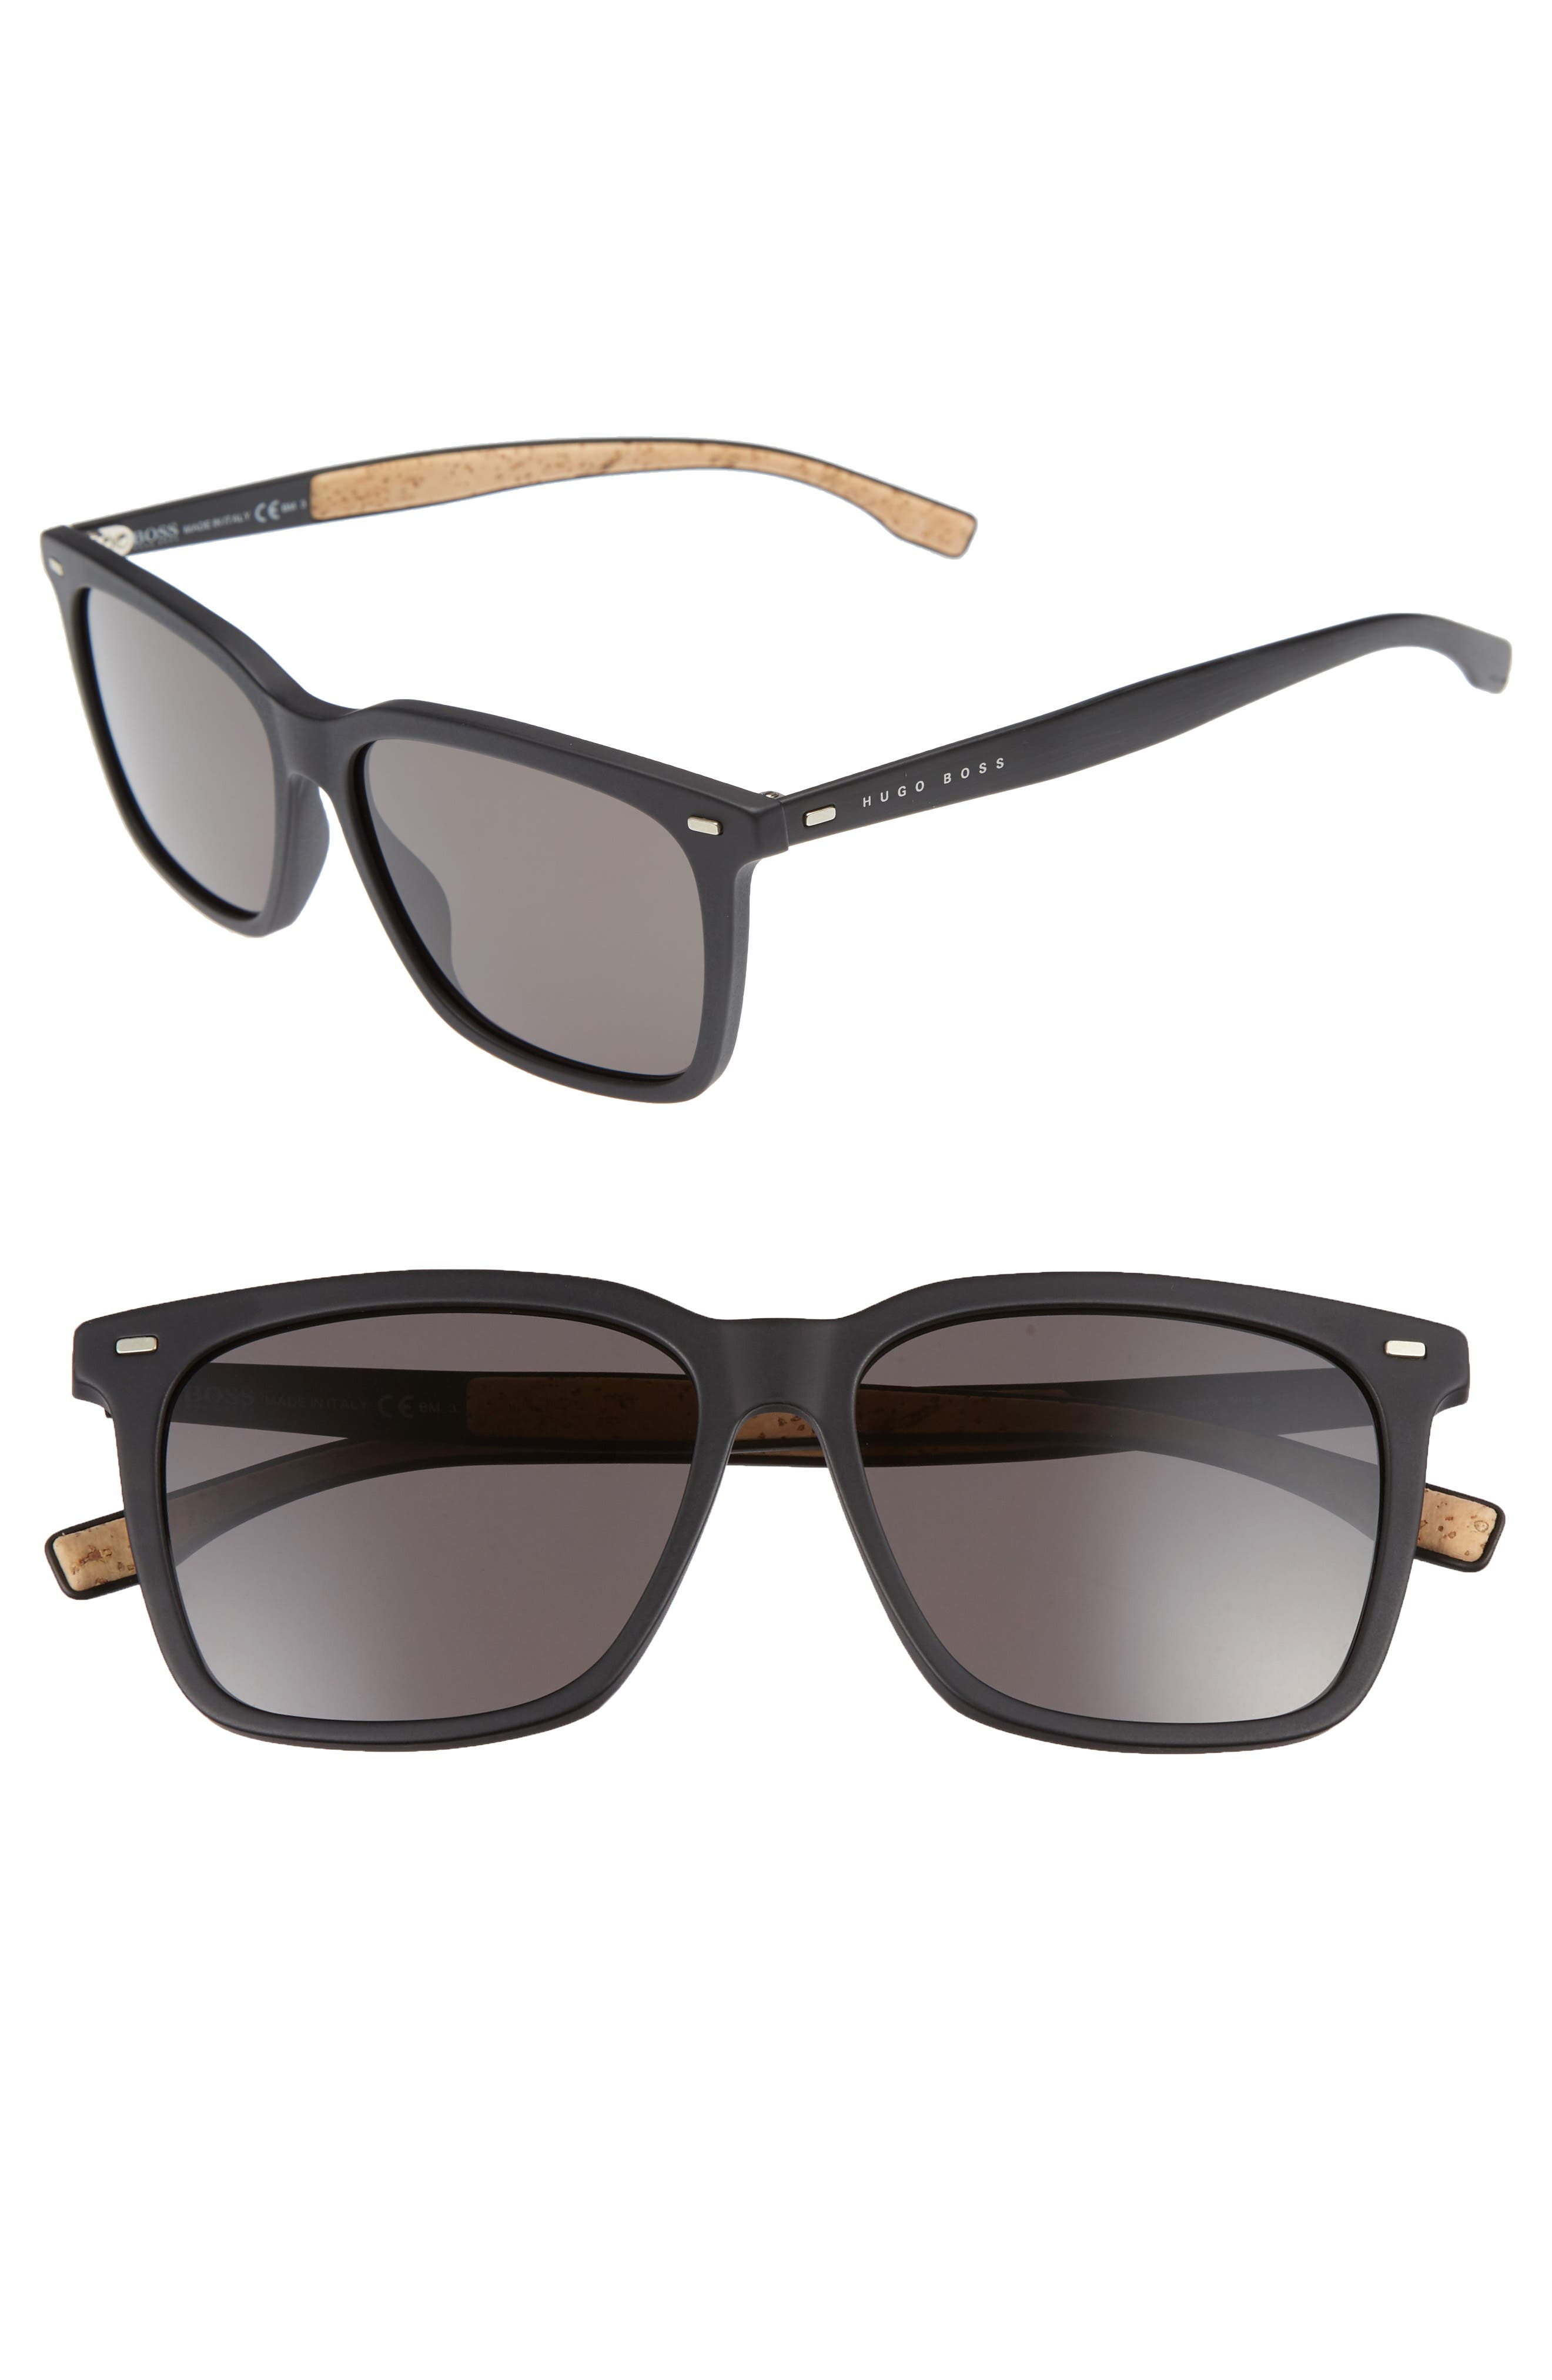 Main Image - BOSS 56mm Sunglasses